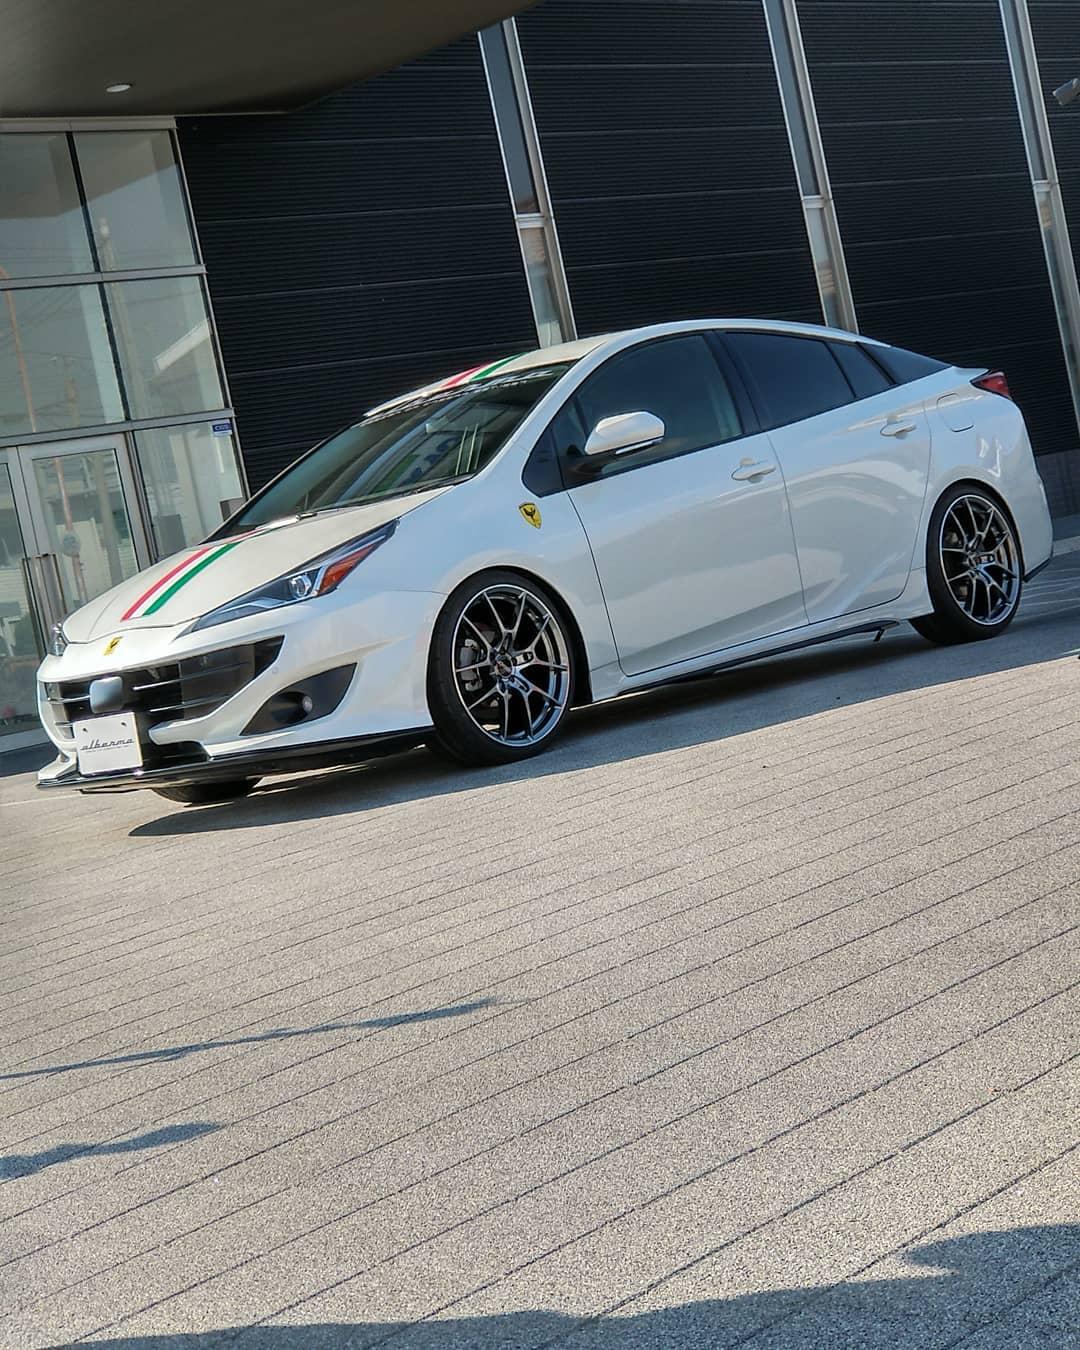 Toyota-Prius-by-Albermo-34